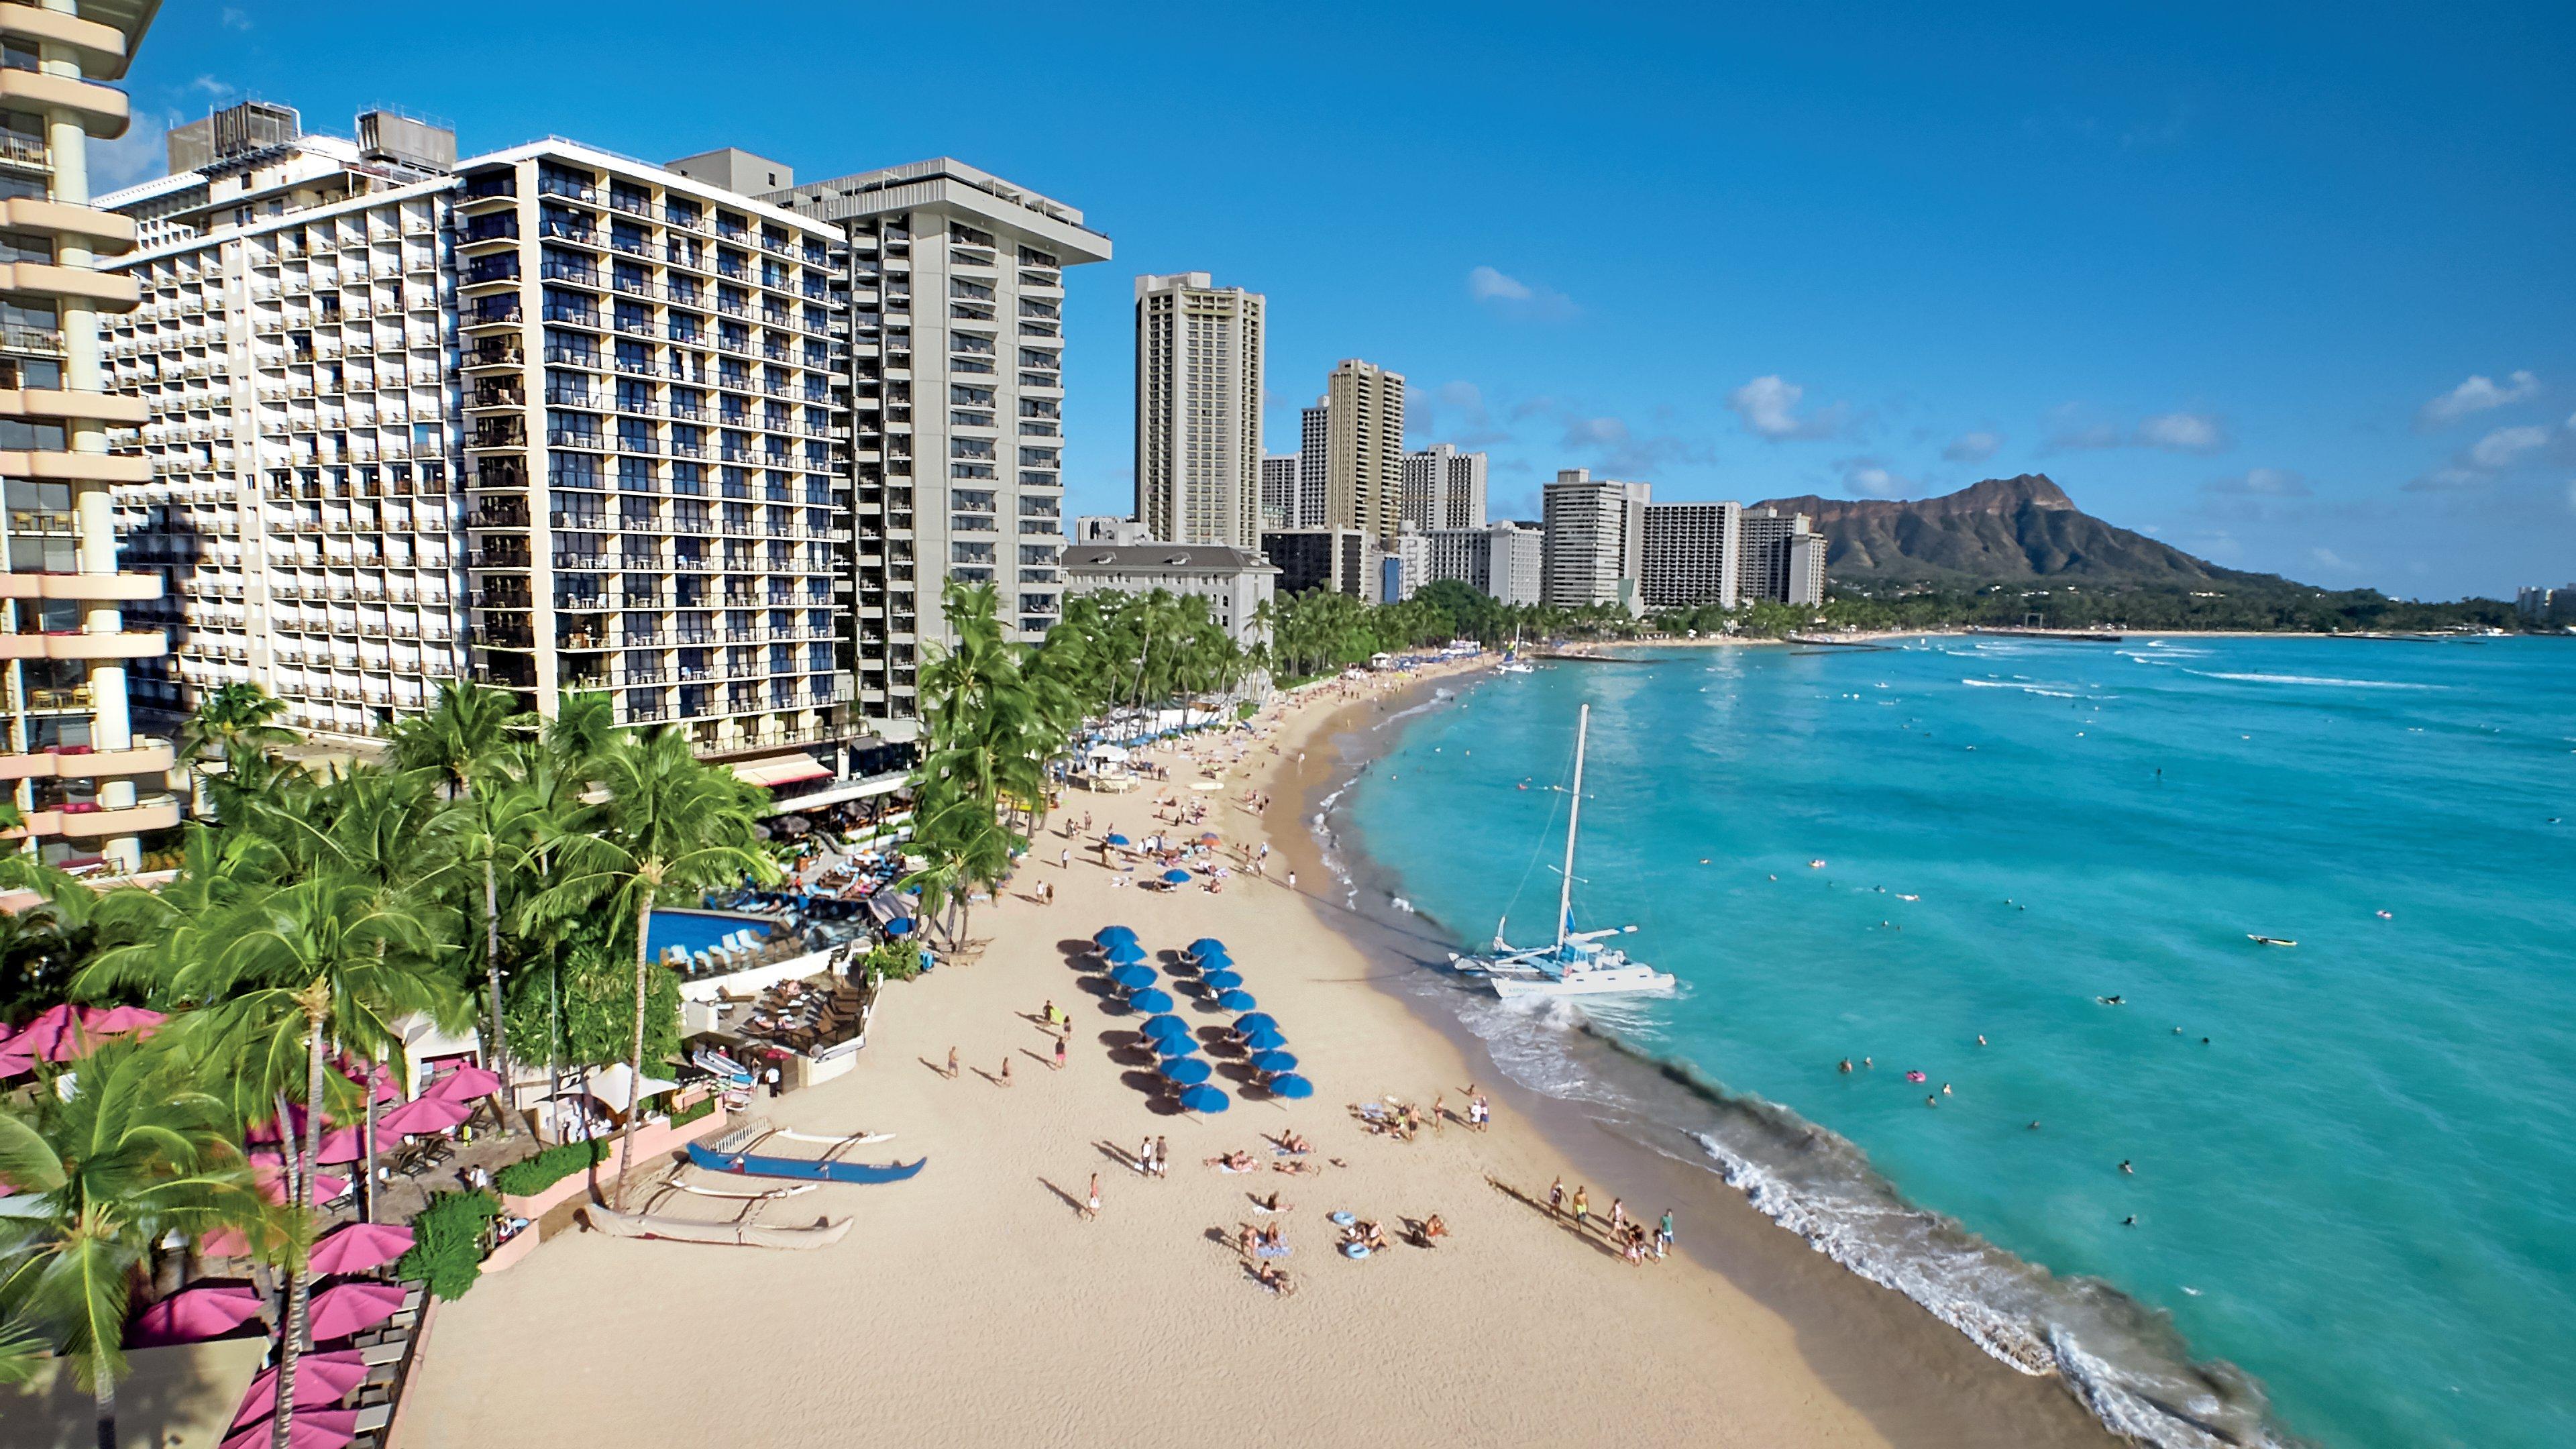 Outrigger Waikiki Beach Resort First